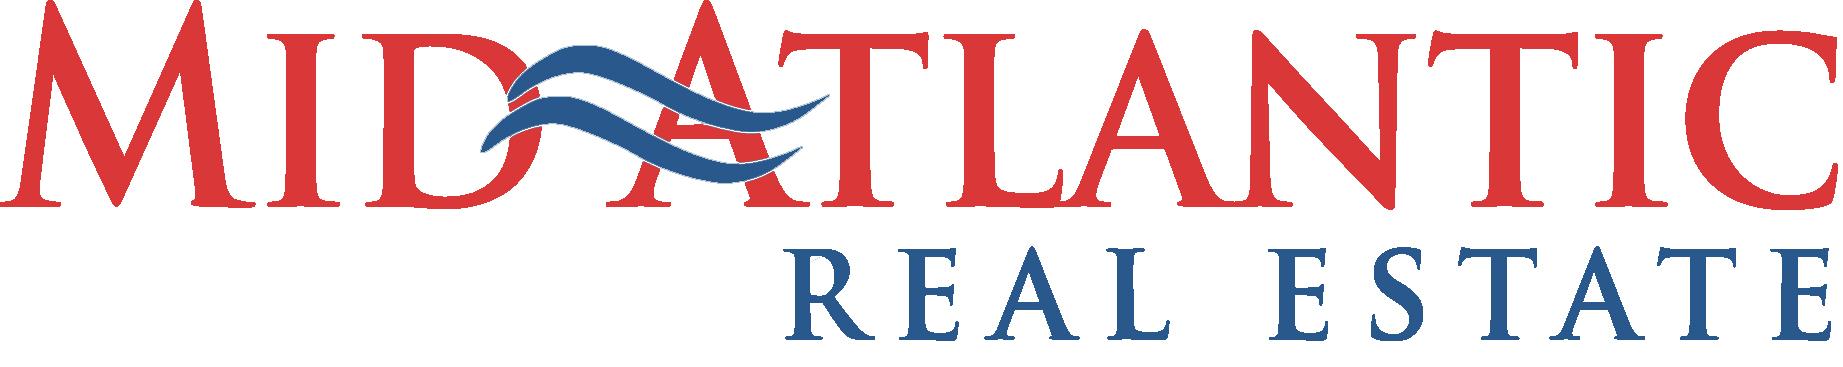 Mid Atlantic Commercial logo